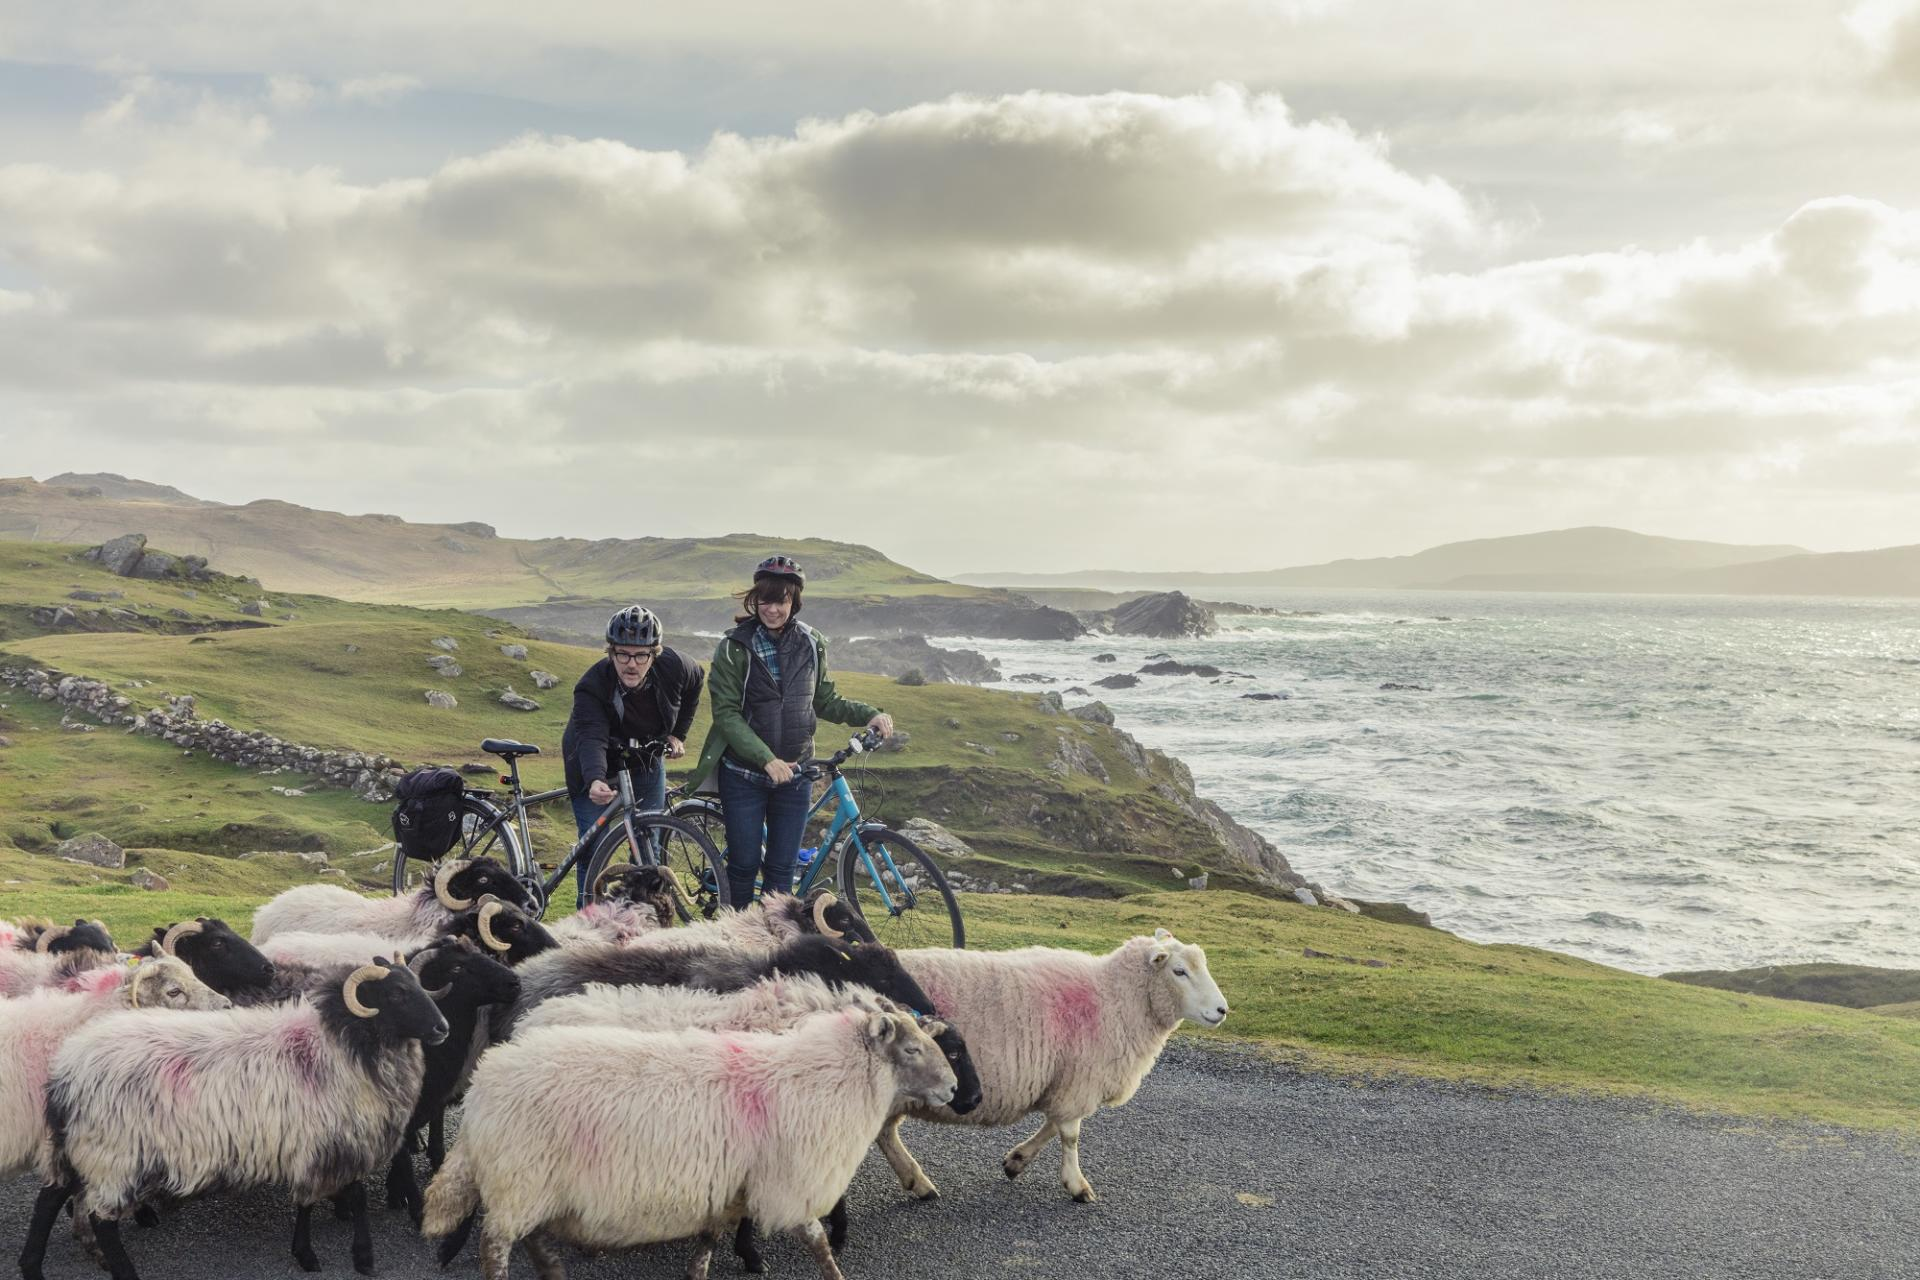 Self-Guided Bike Tour On The Wild Atlantic Way of Ireland